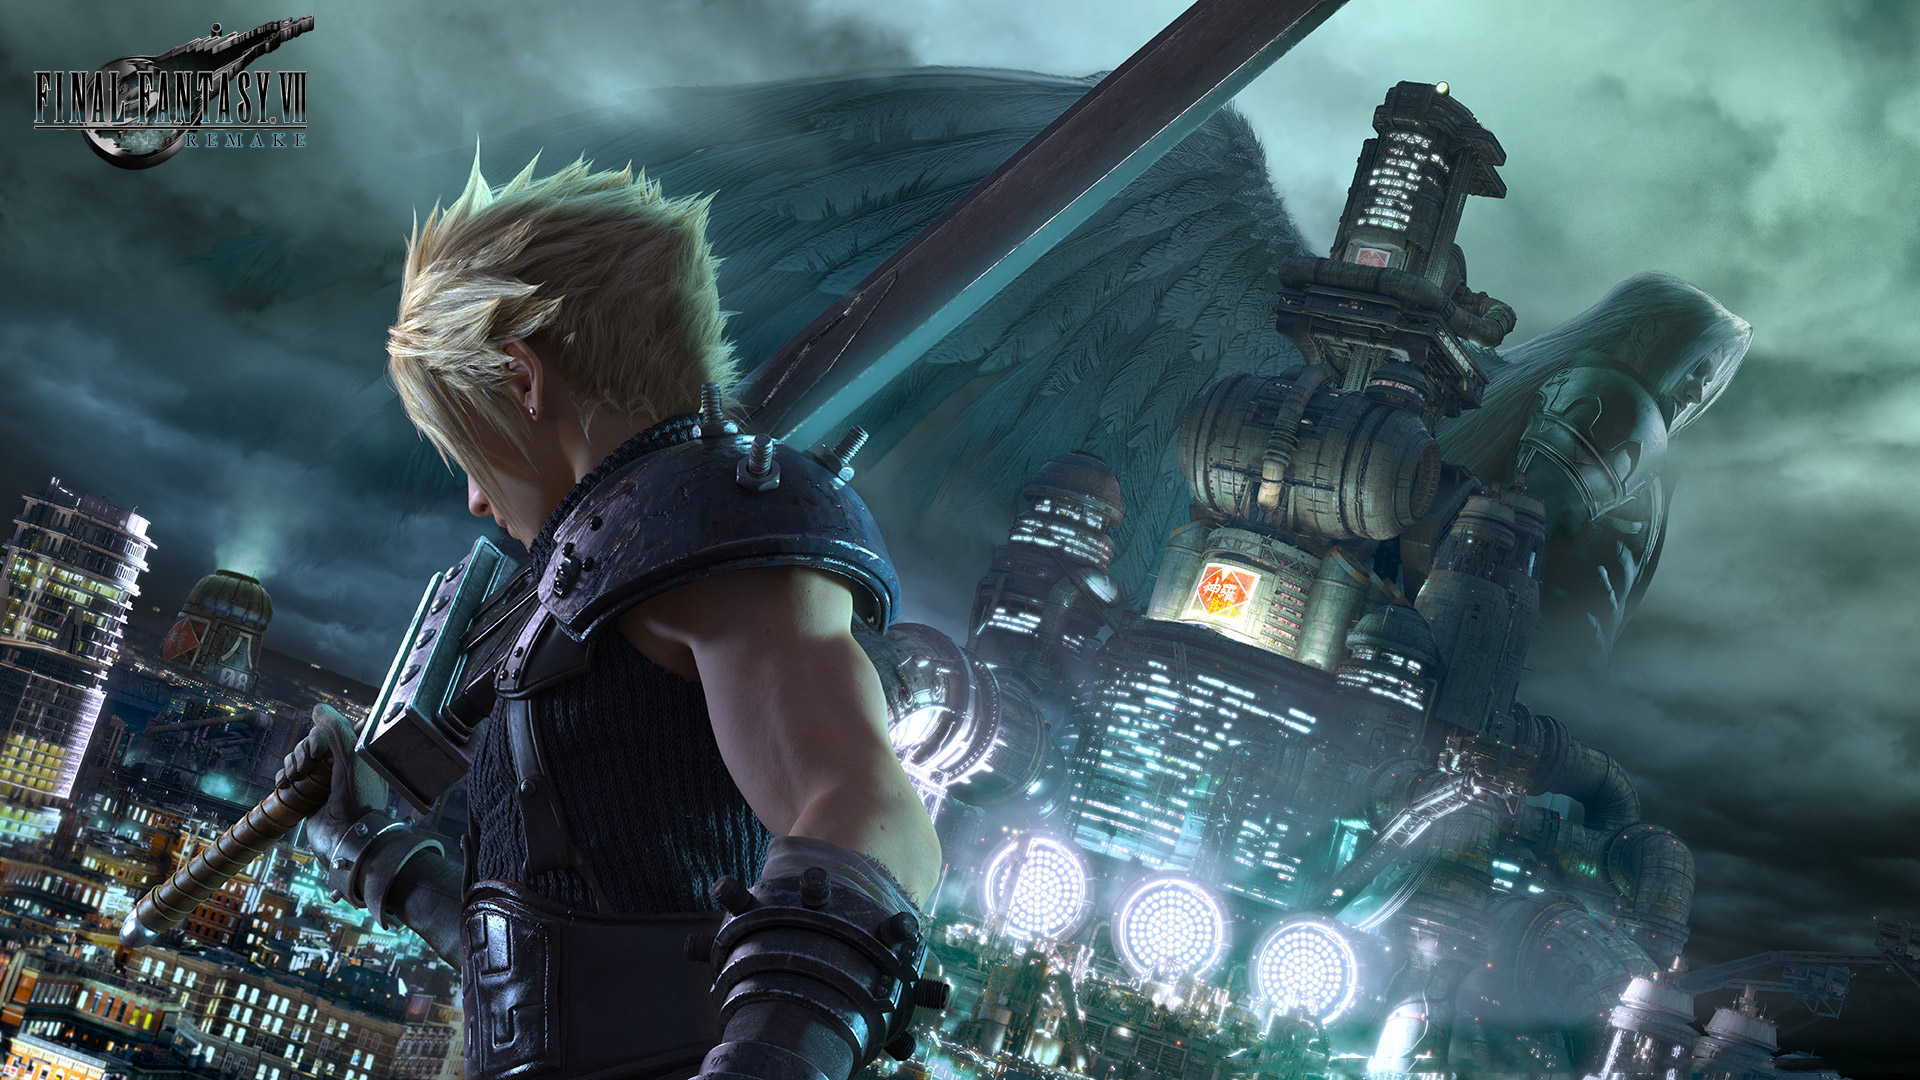 Free Final Fantasy VII Remake Wallpaper in 1920x1080